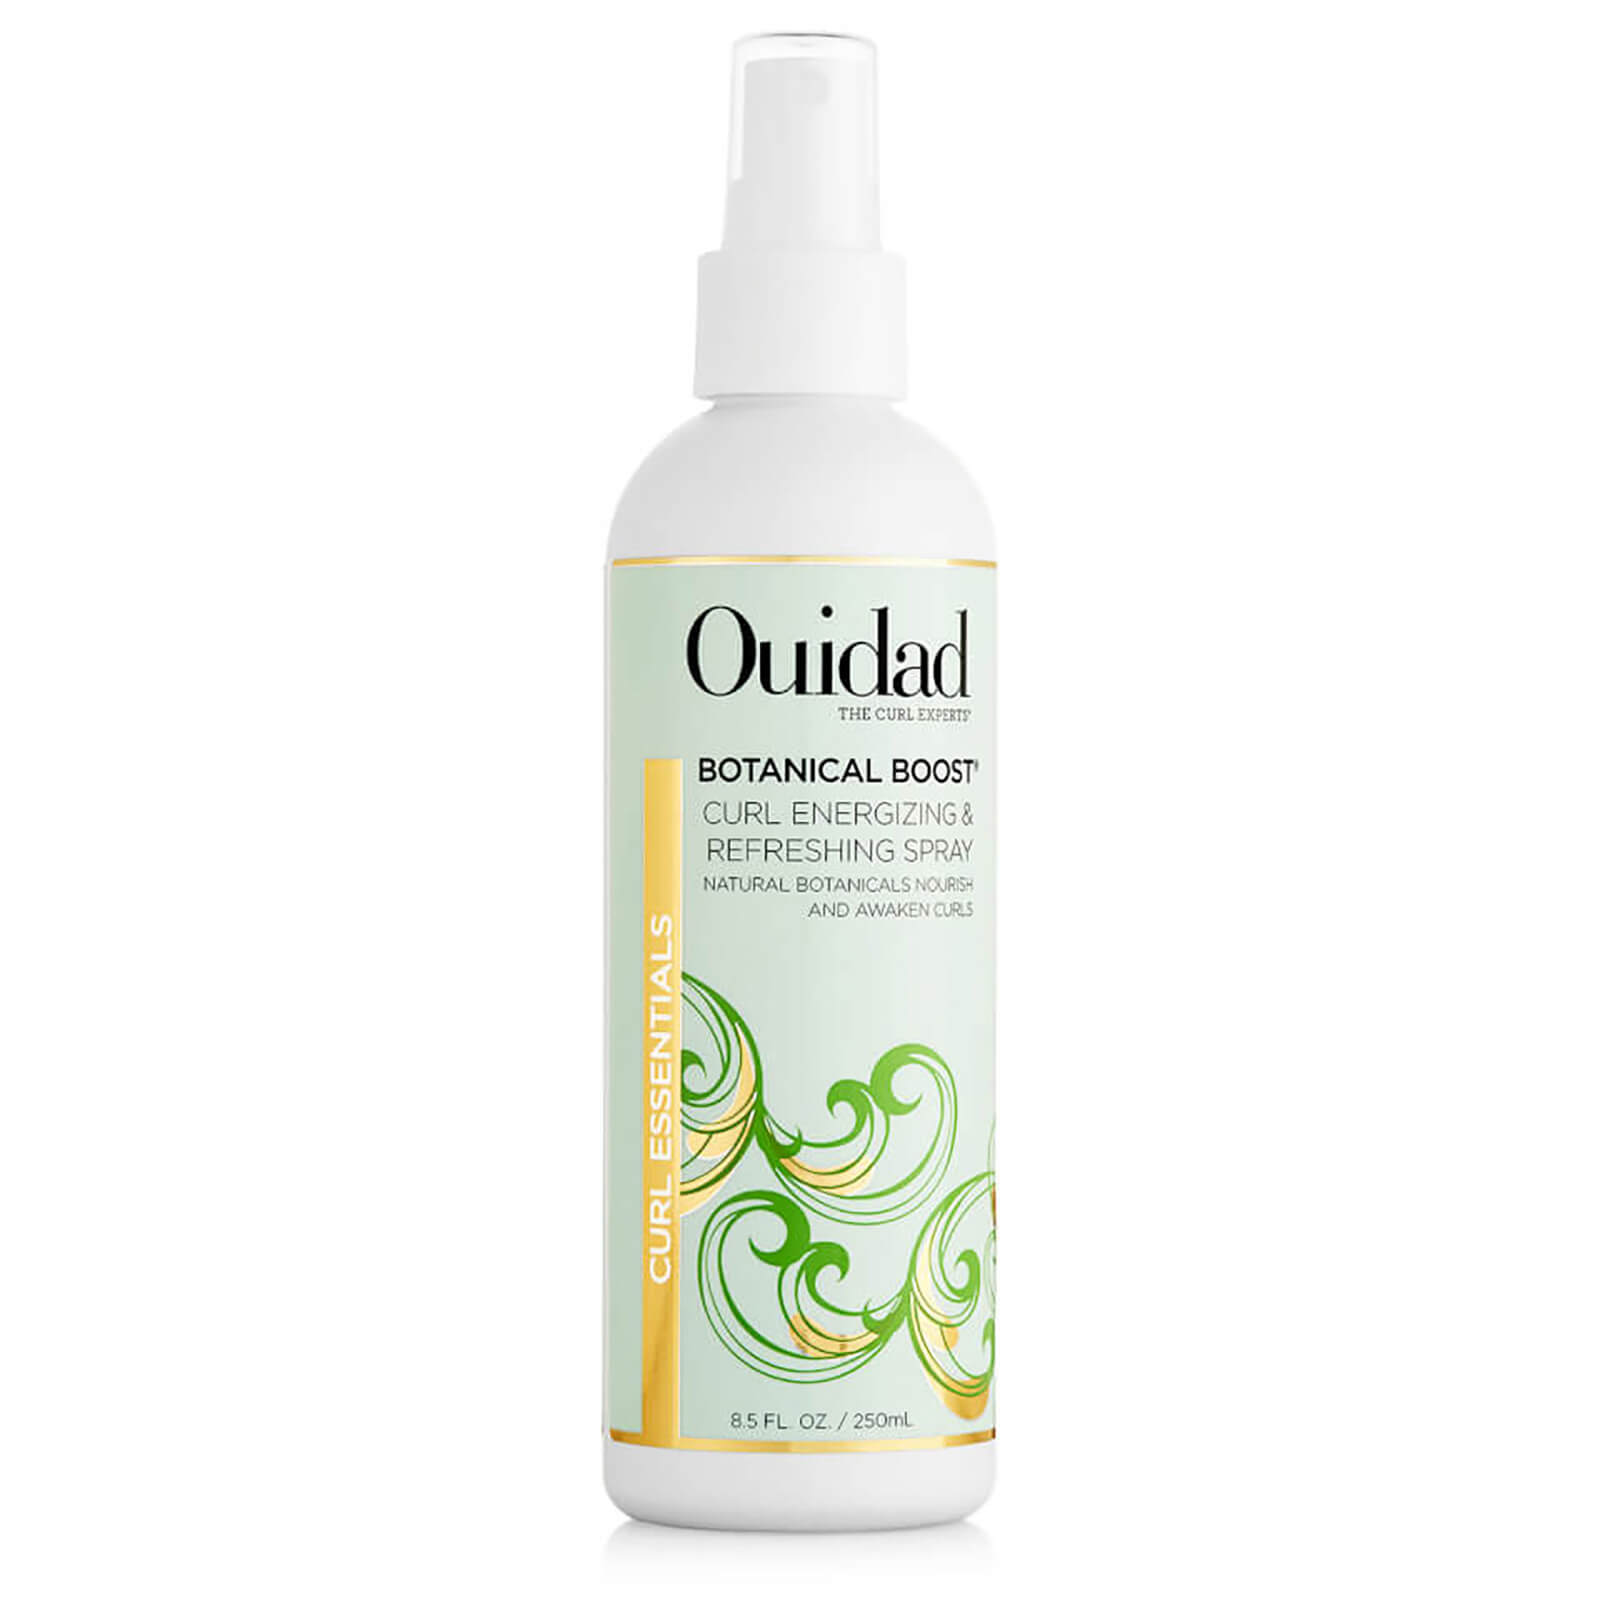 Купить Ouidad Botanical Boost Curl Energising and Refreshing Spray 250ml